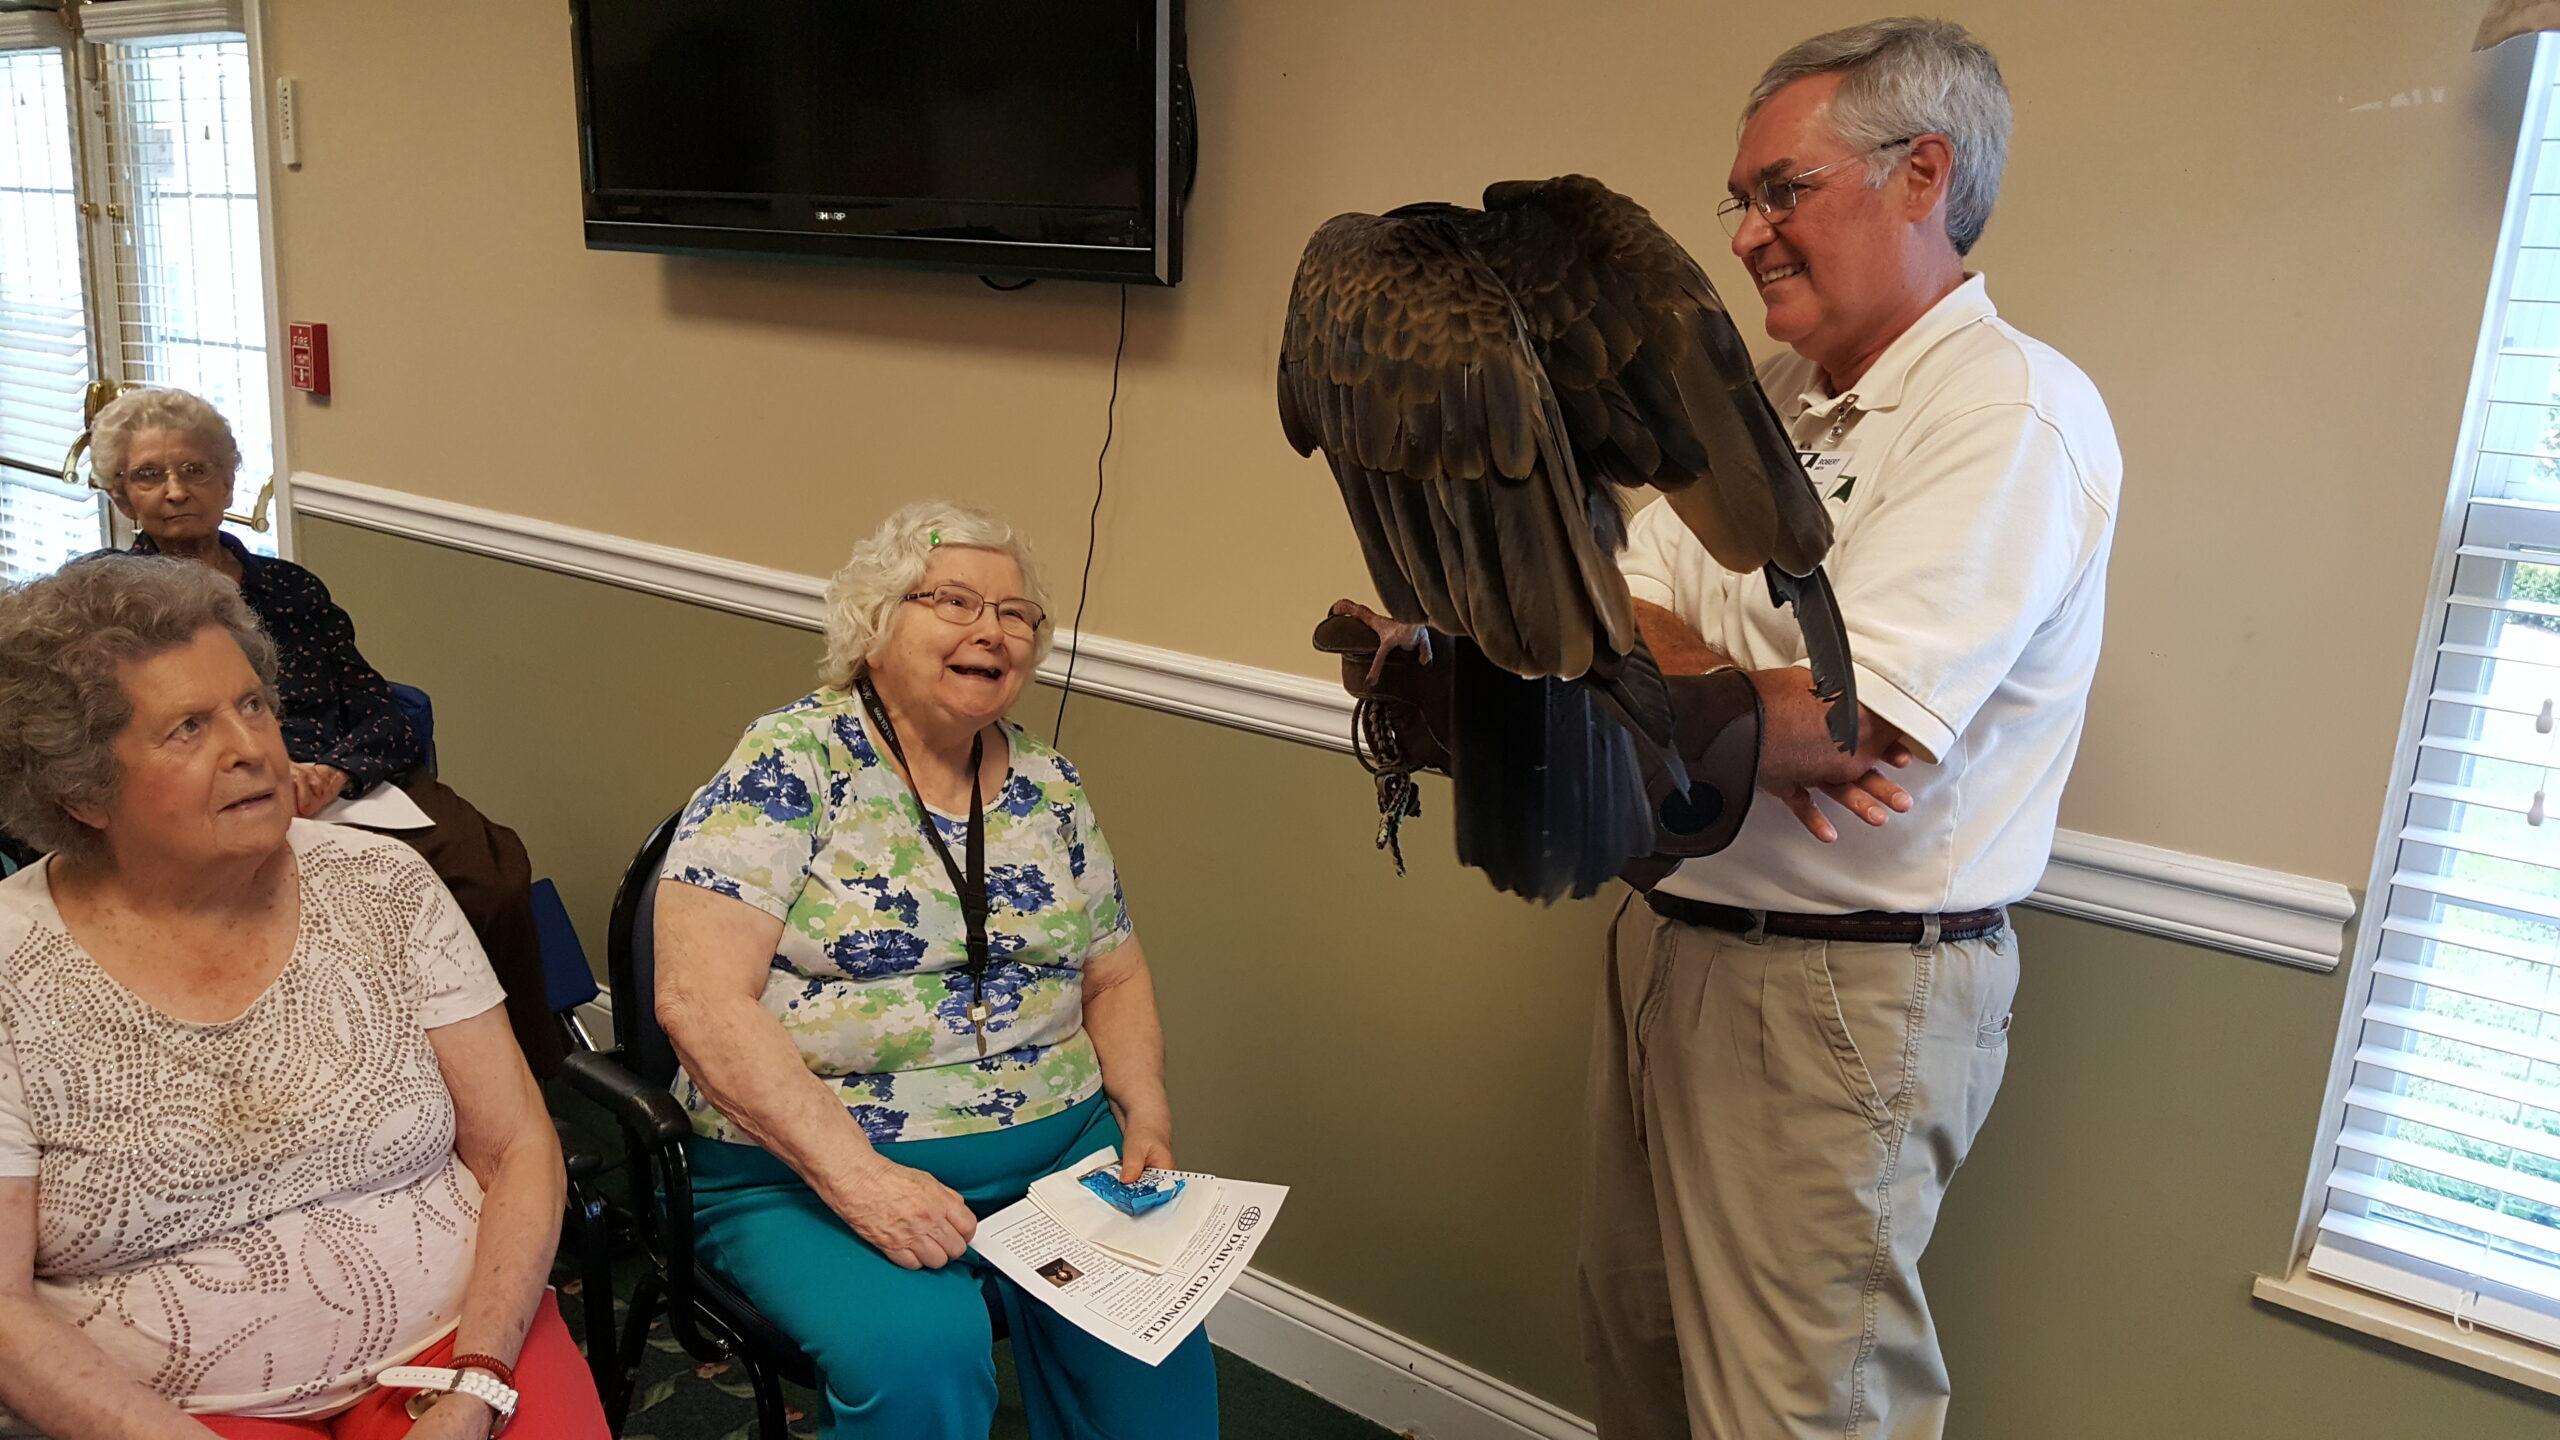 Residents Juanita Hume and Barbara Vorpe meet Earl the Vulture as Robert holds him